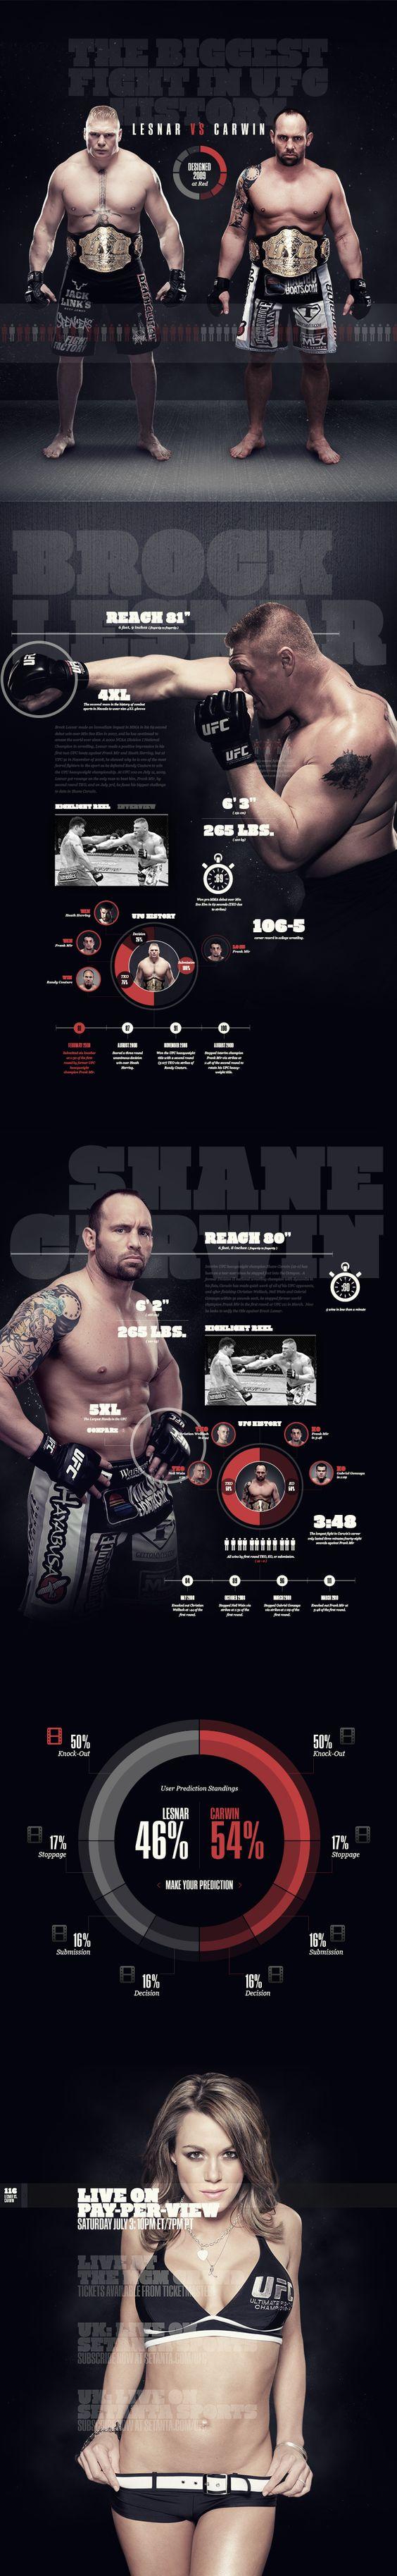 UFC 116 Web Design